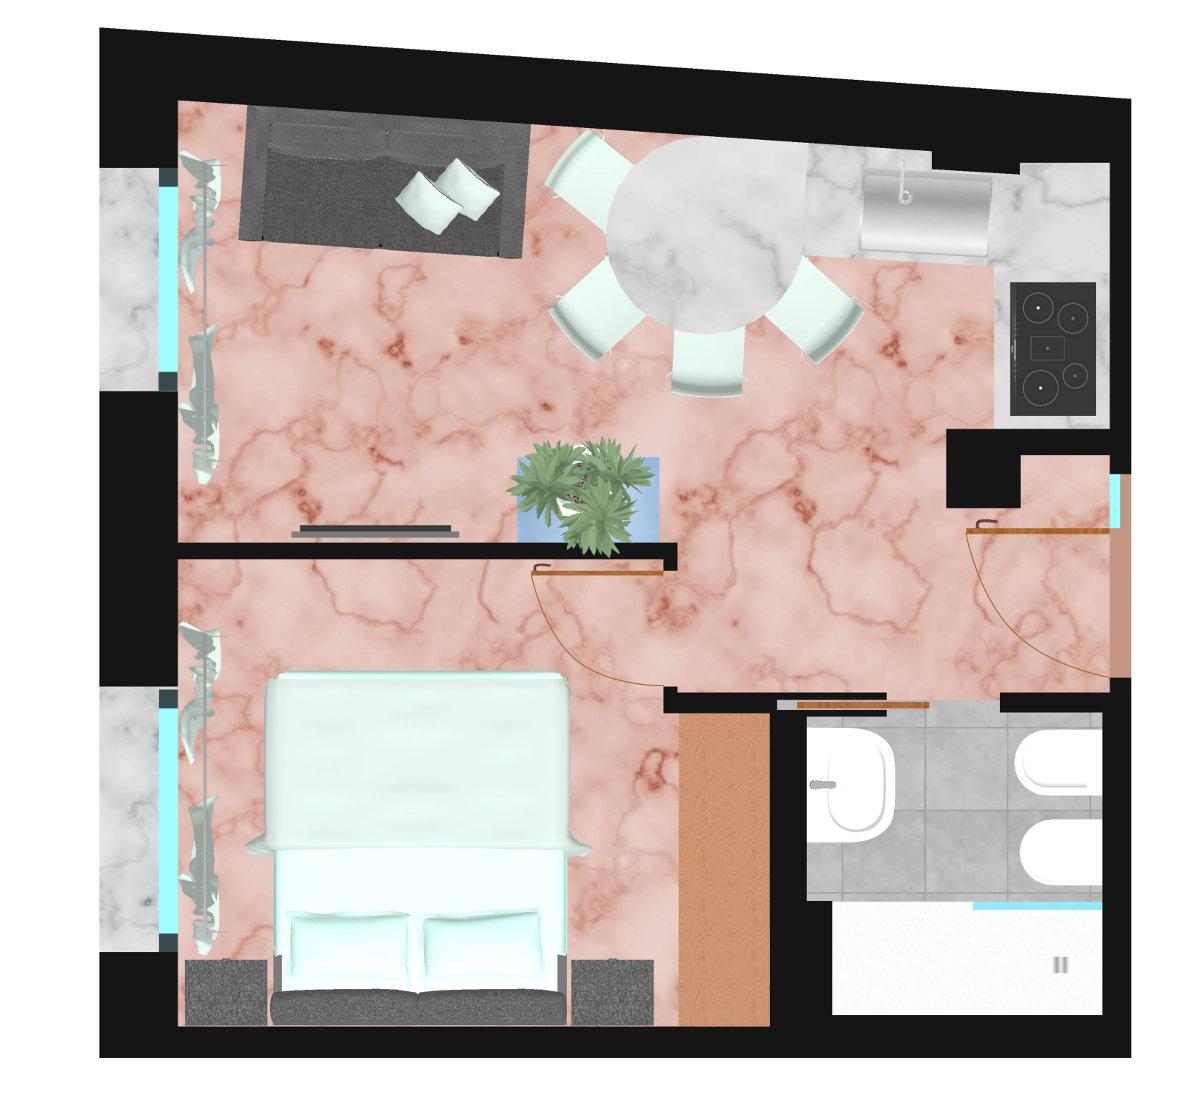 piantina-appartamento-i-tetti | Ugo Bassi Apartments